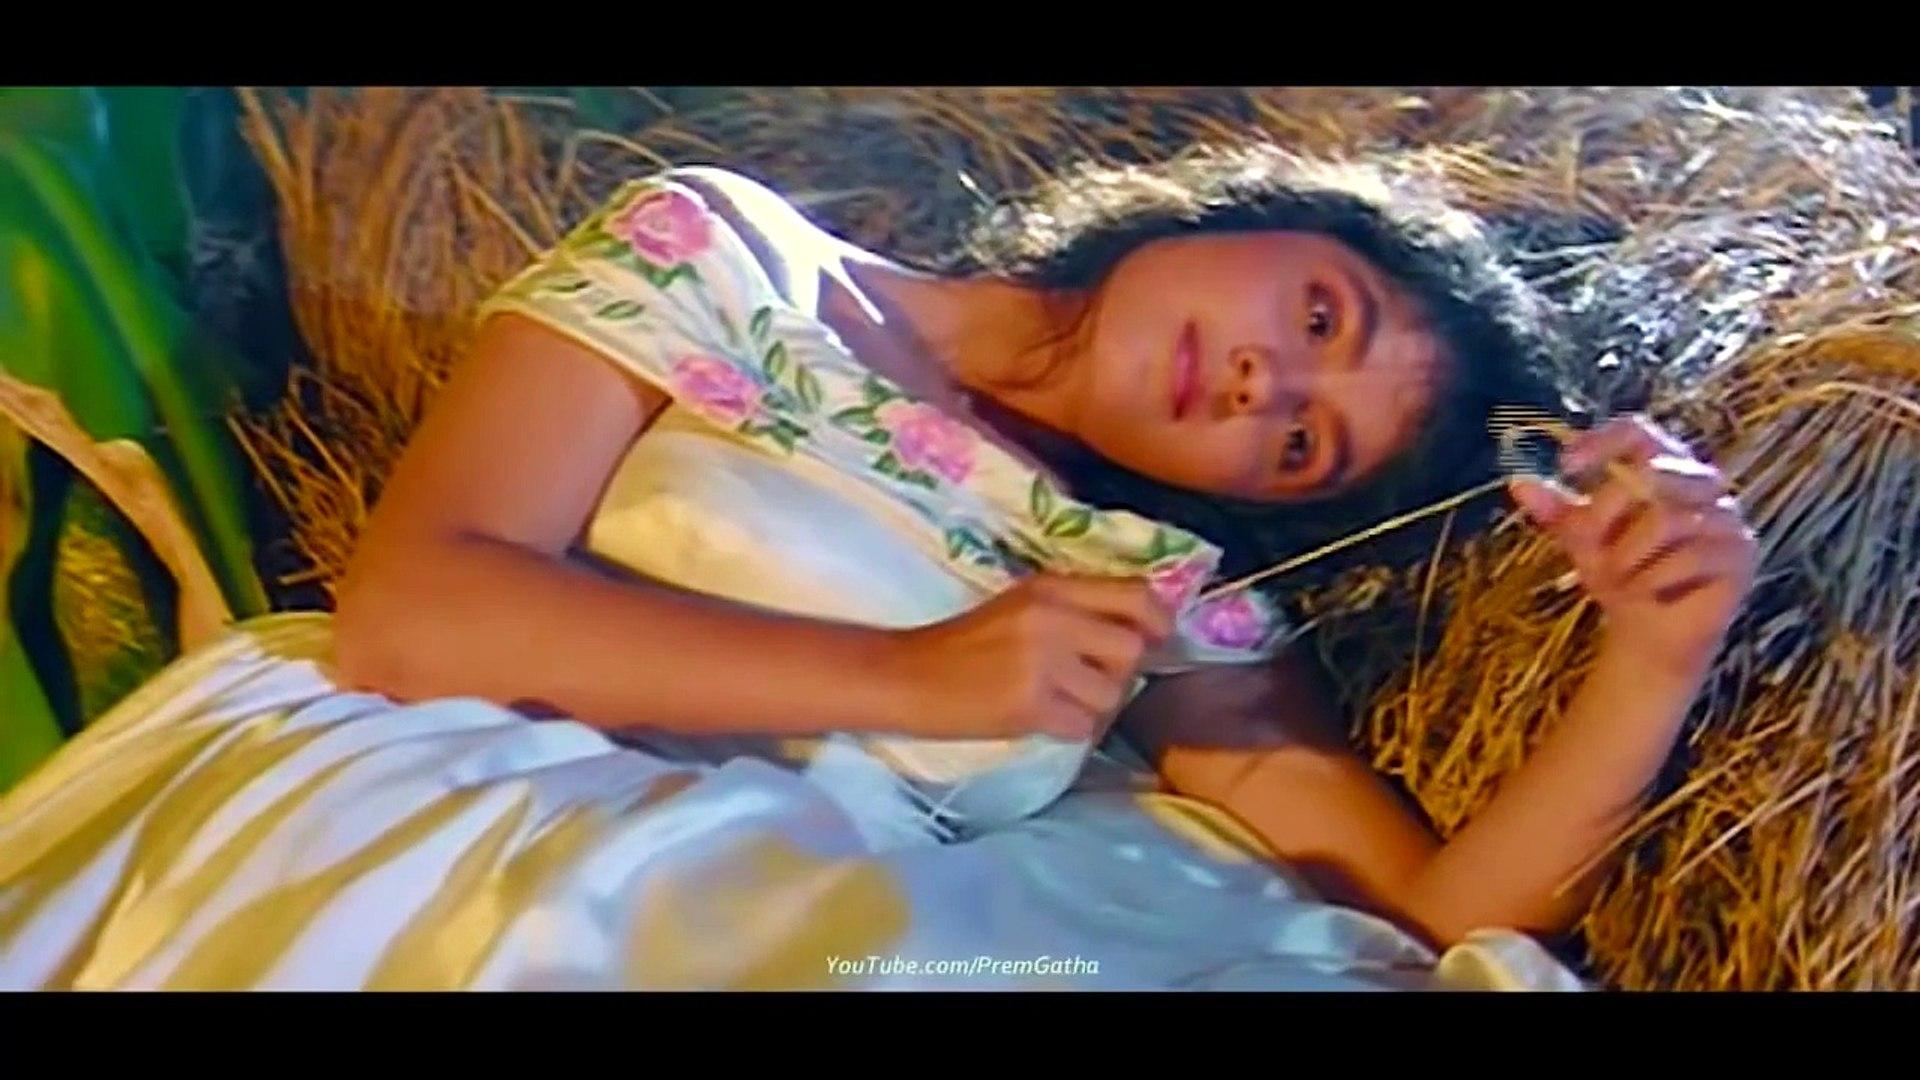 Dil Hai Ki Manta Nahin - Title Song (720p HD Song)